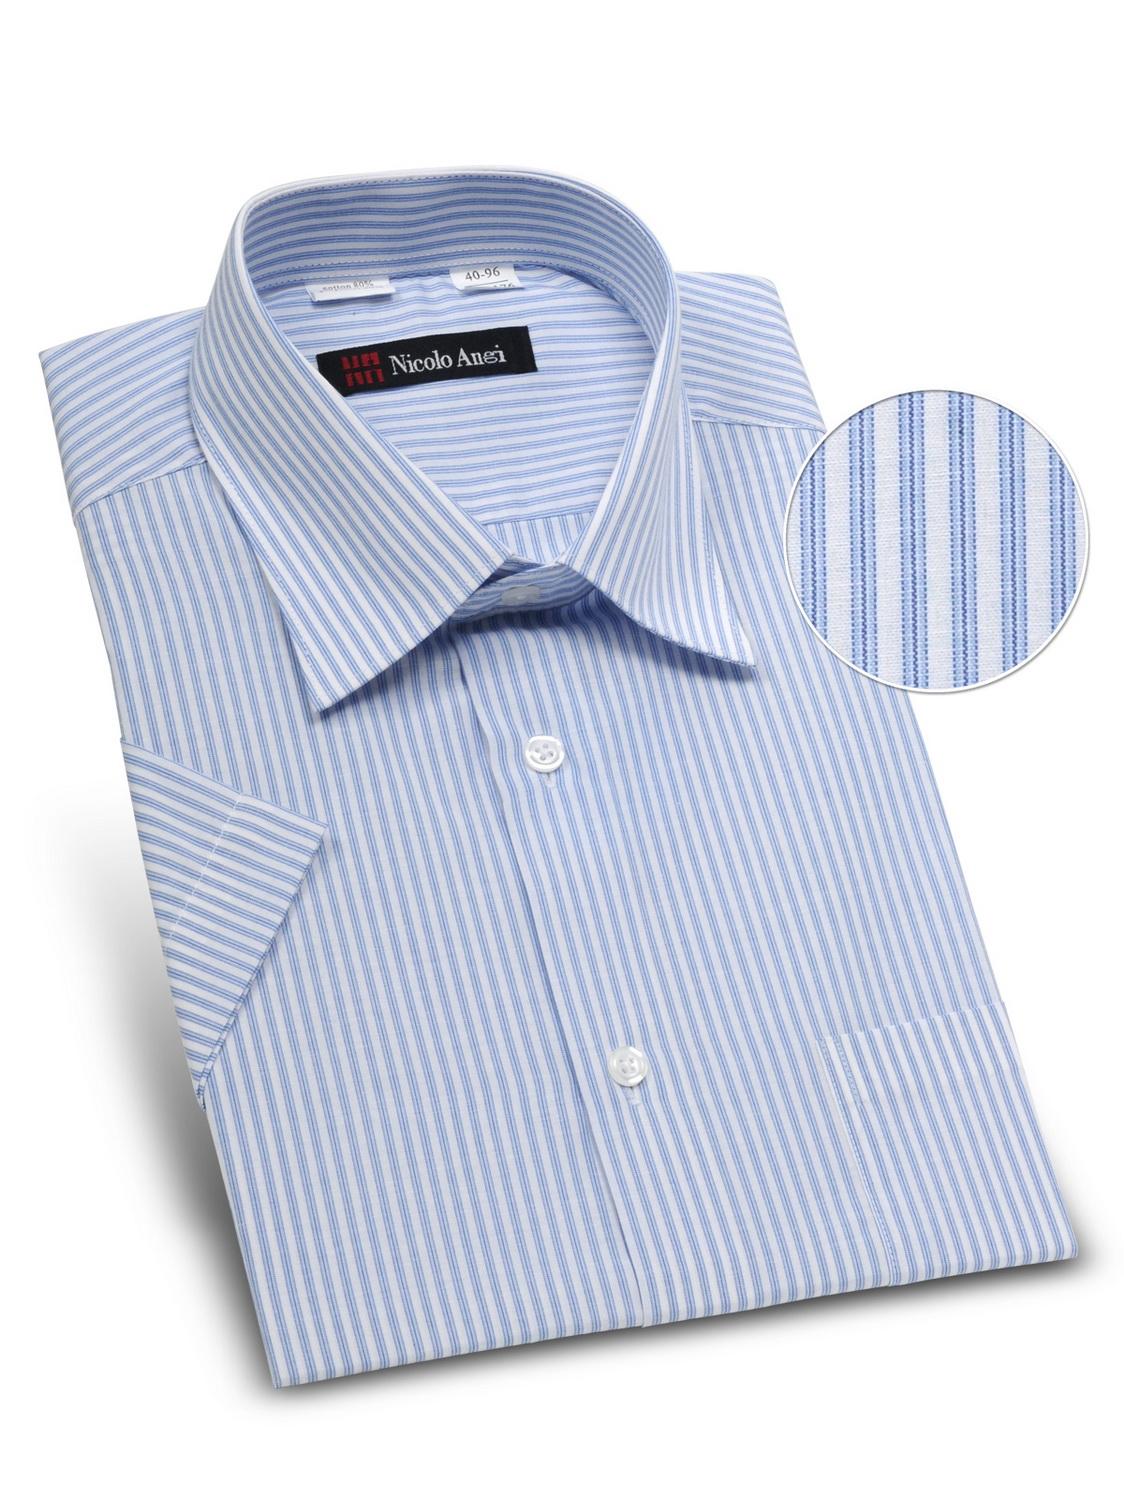 Рубашка мужская iv60711 бюстье serge 1006 7 рост 170